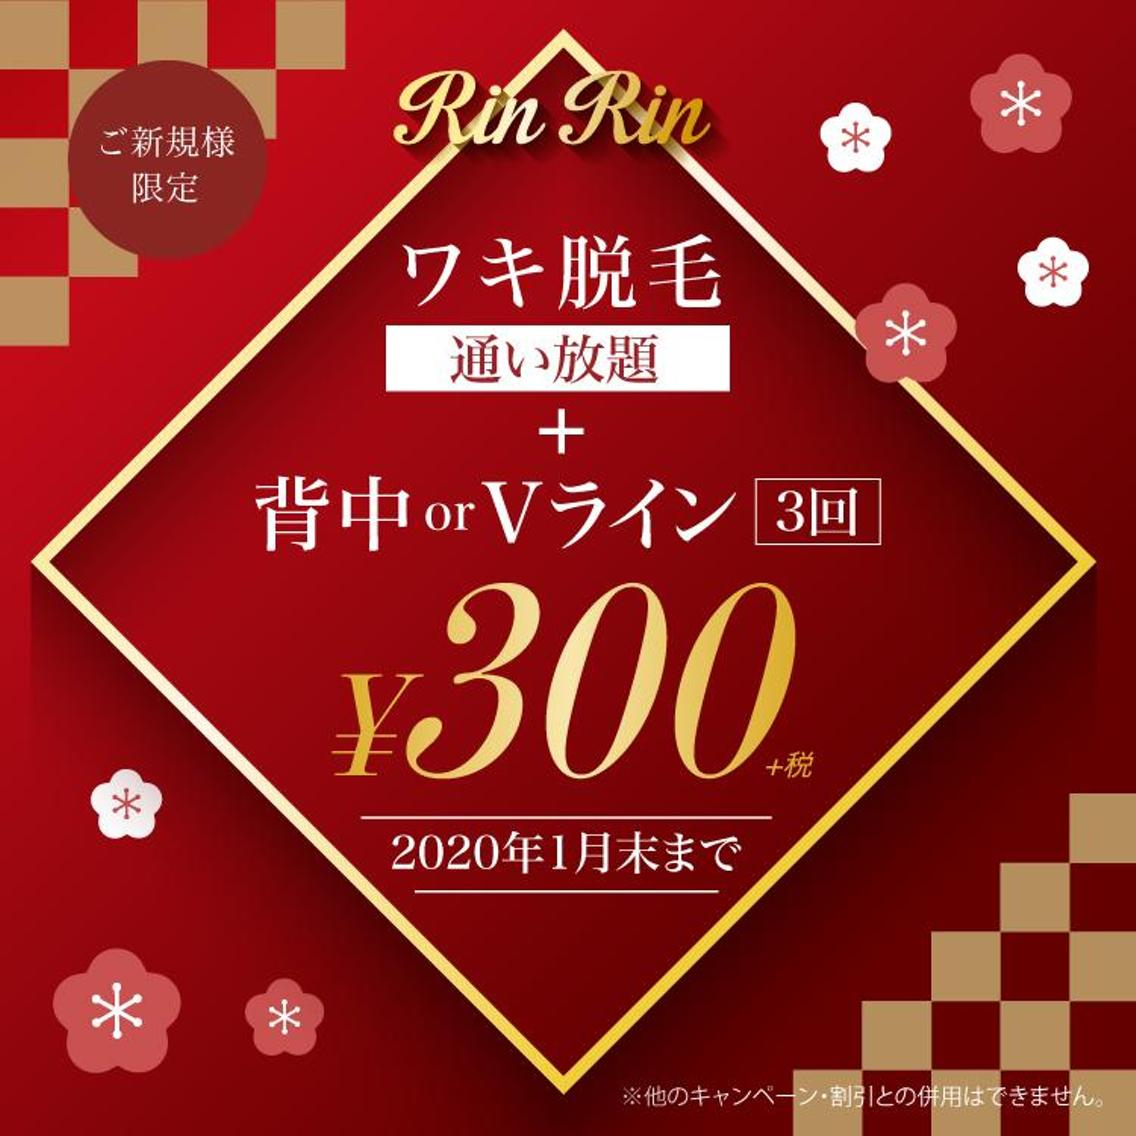 RinRin姫路店所属・RinRin 姫路店の掲載